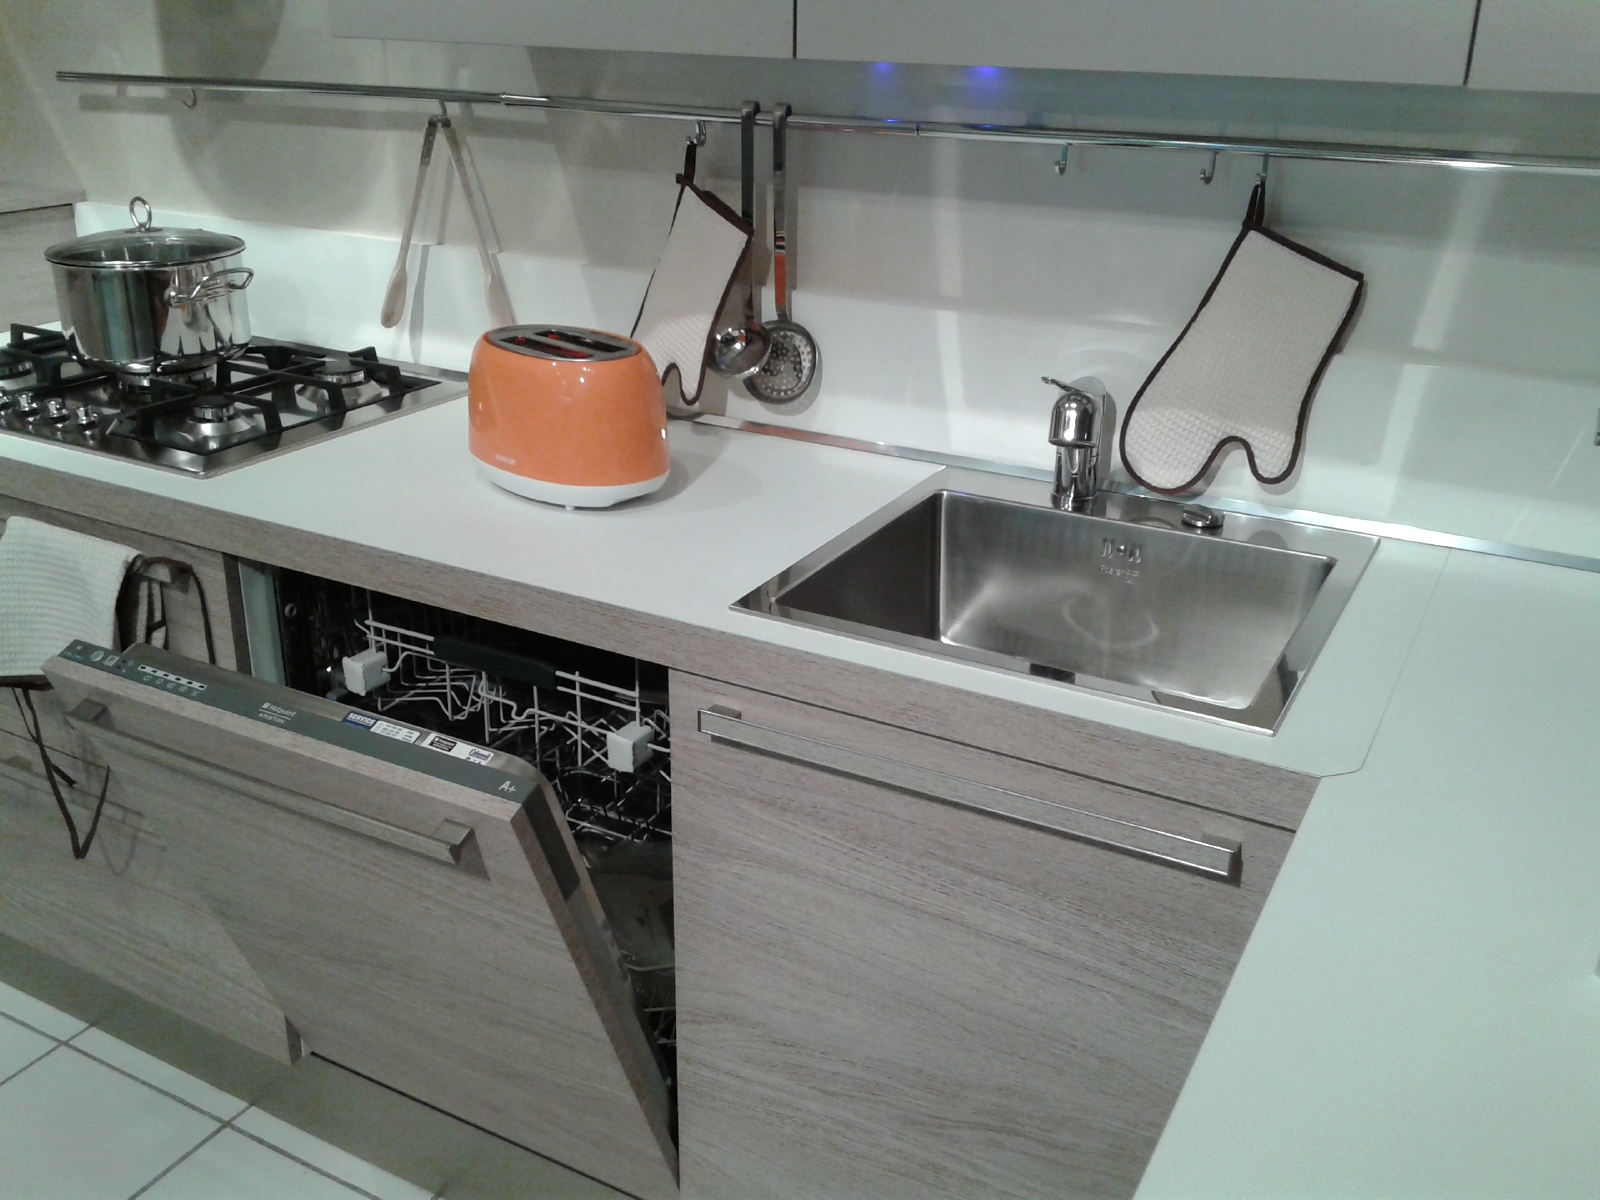 Cucina Veneta Cucine Ethica Decorativo Laminato Materico Cucine A  #945637 1600 1200 Veneta Cucine è Una Buona Marca